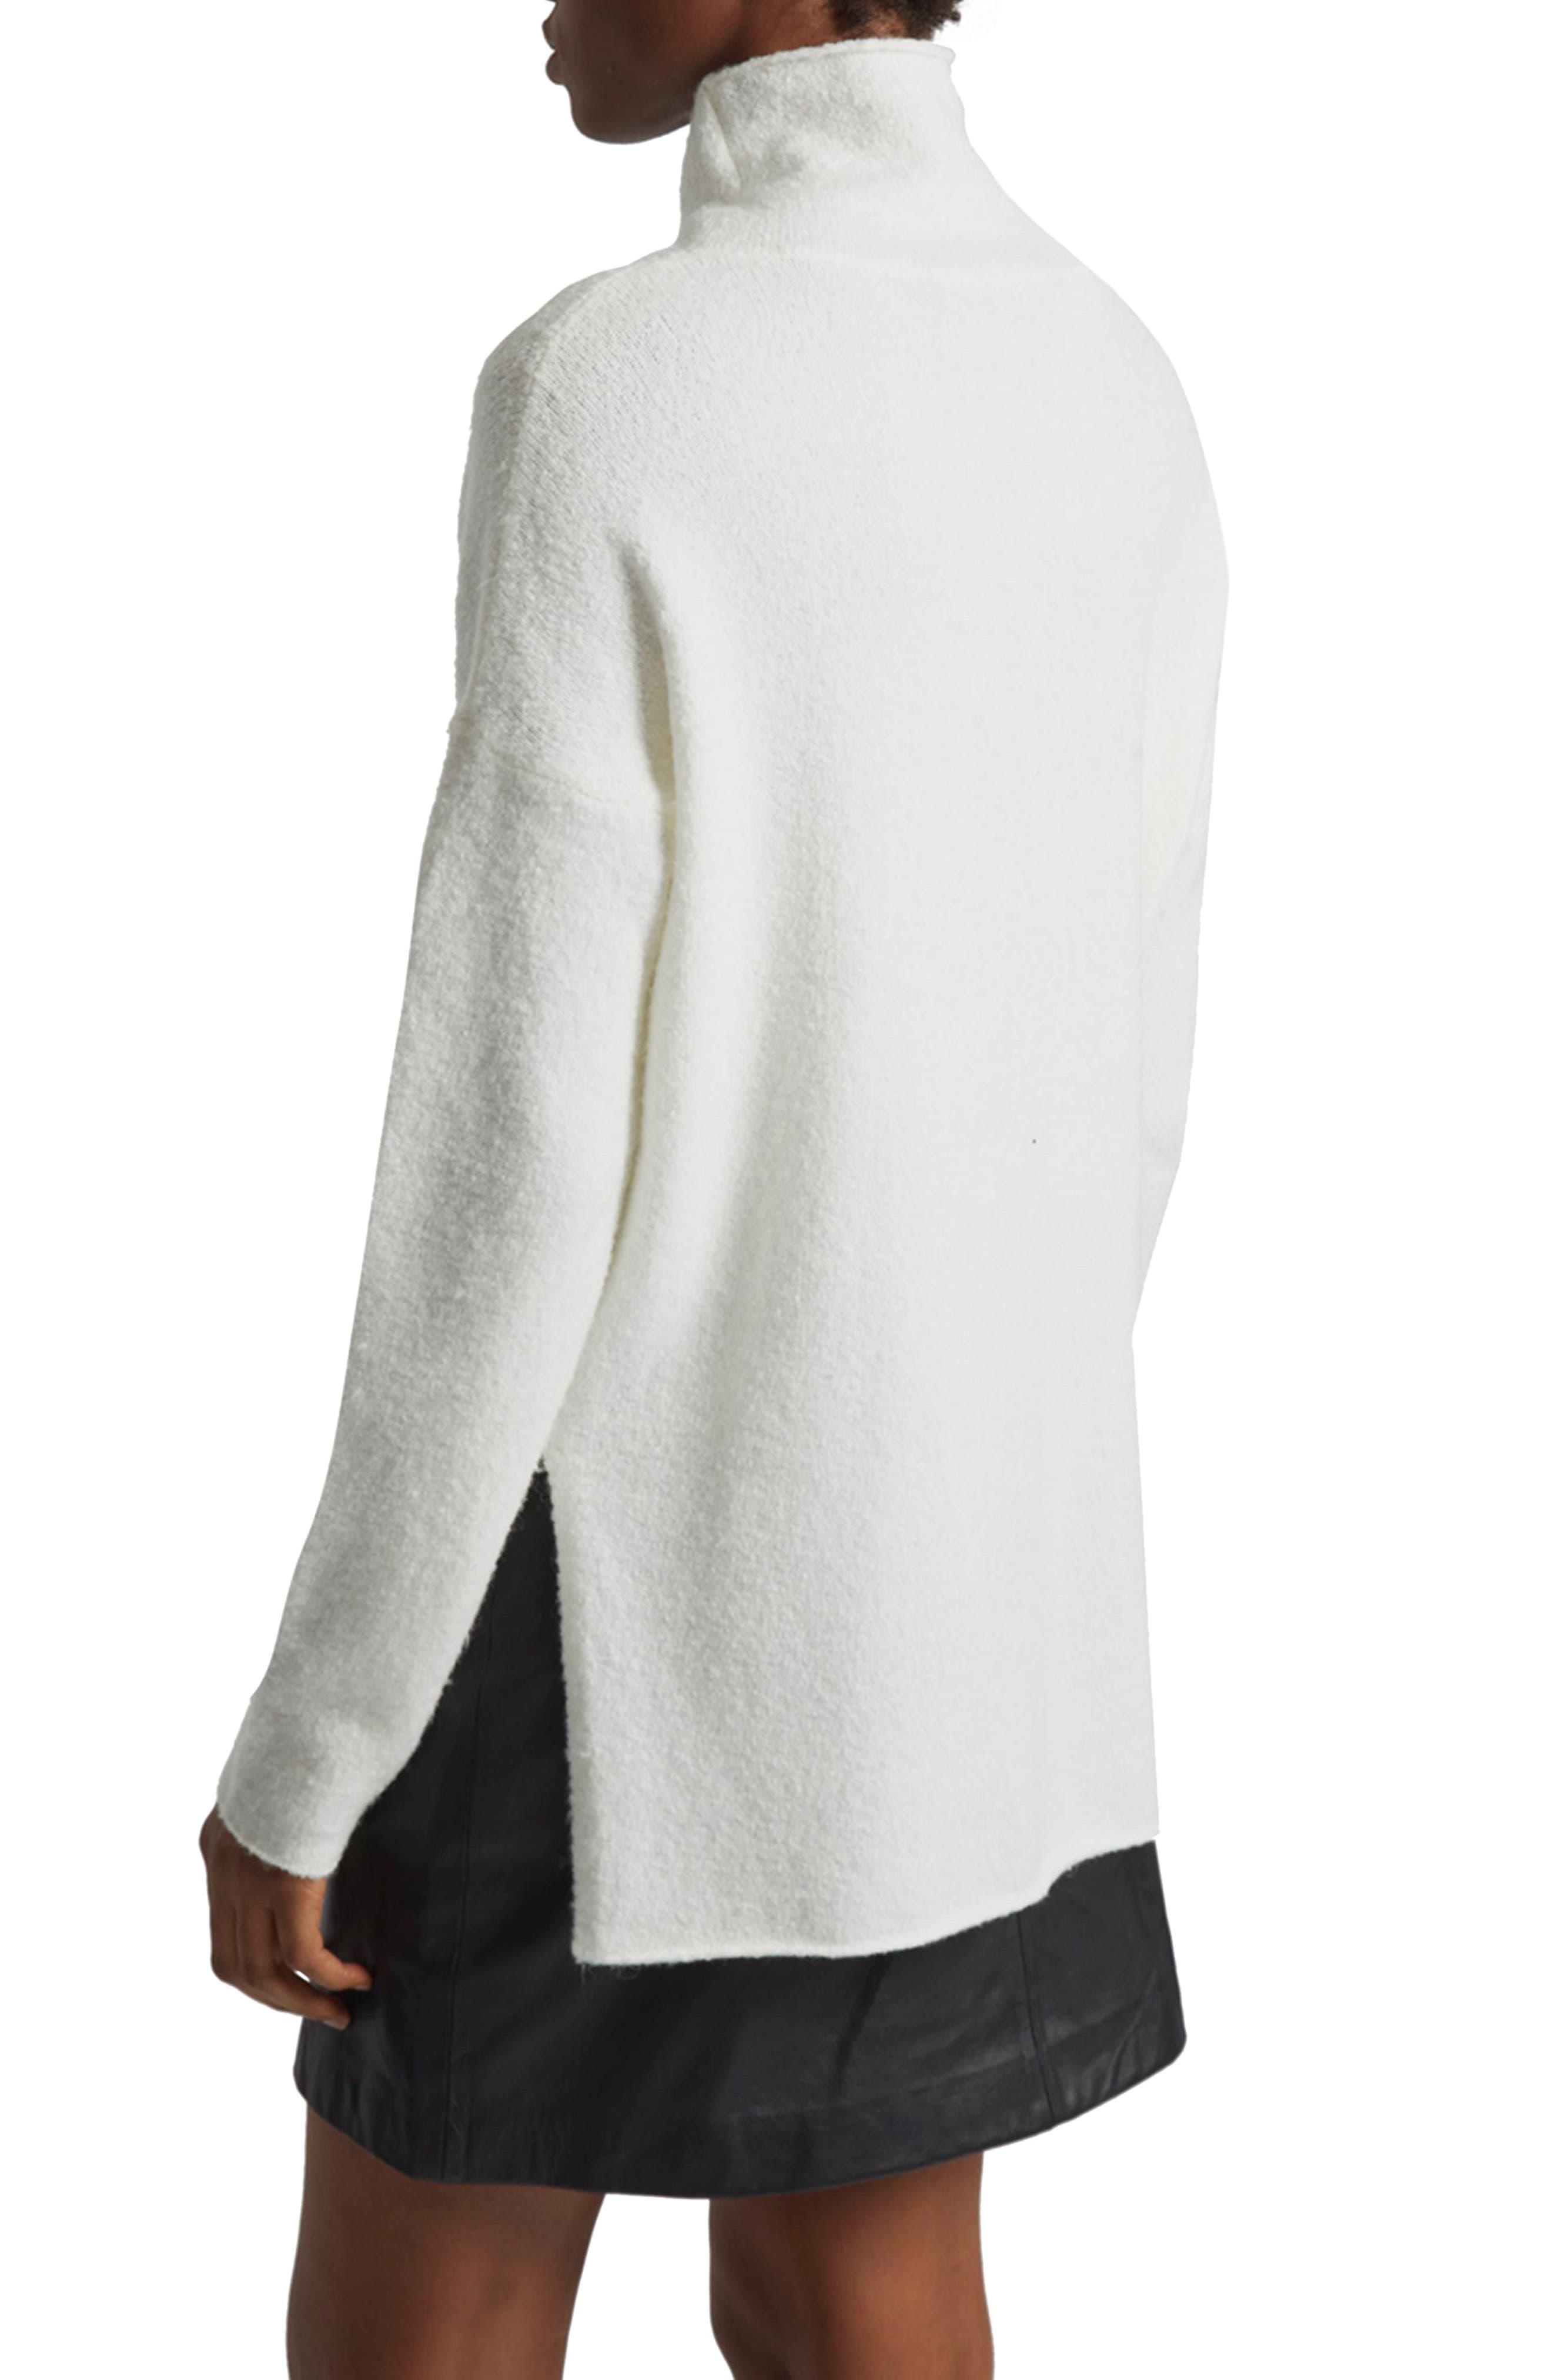 Aya Flossy Mock Neck Sweater,                             Alternate thumbnail 2, color,                             Winter White